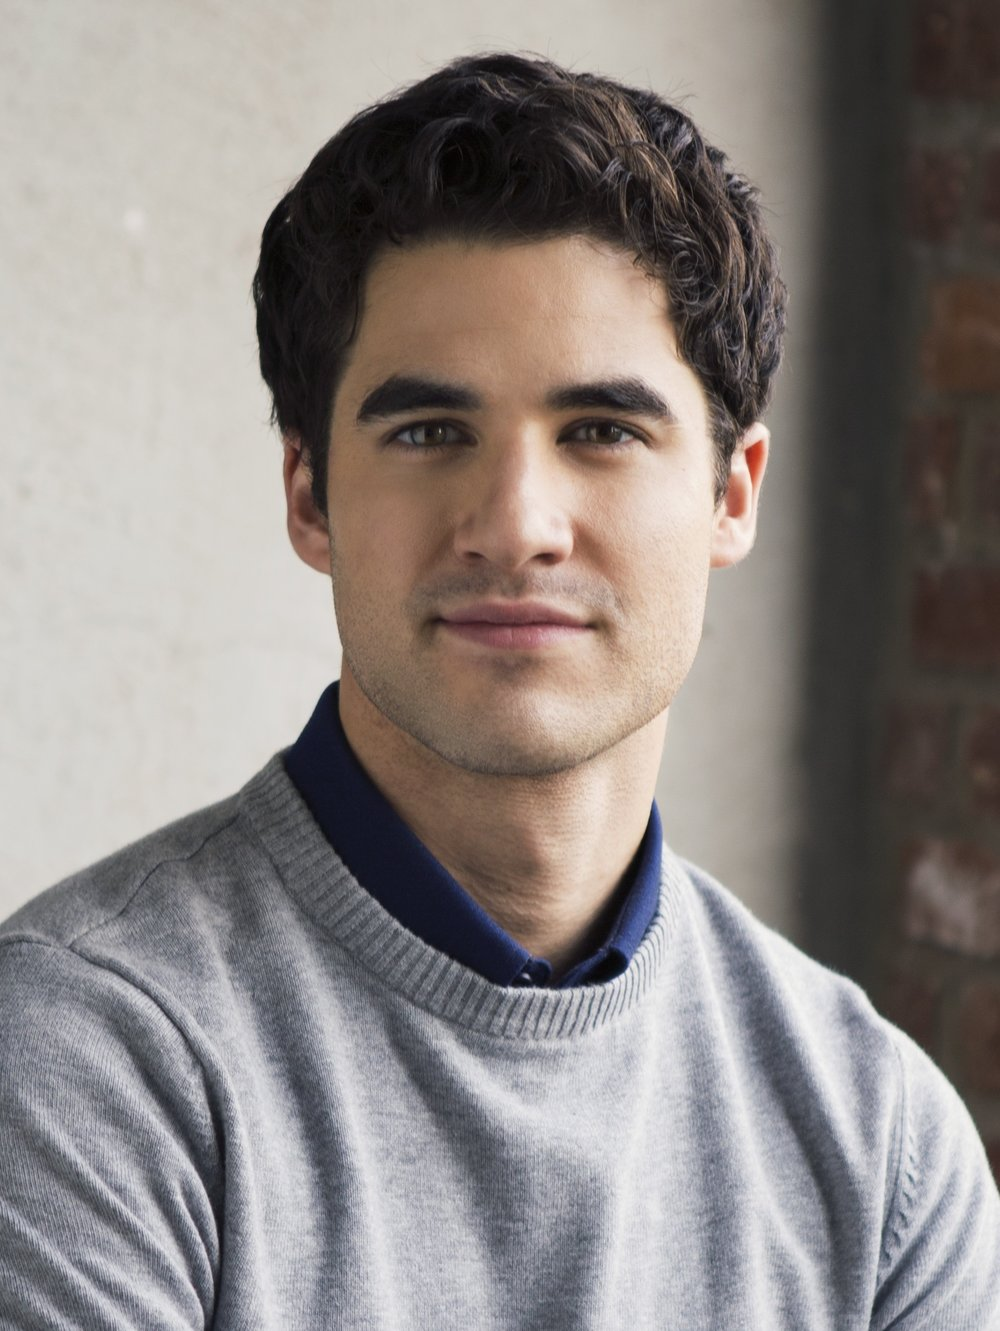 Darren-Criss-cropped1.jpg